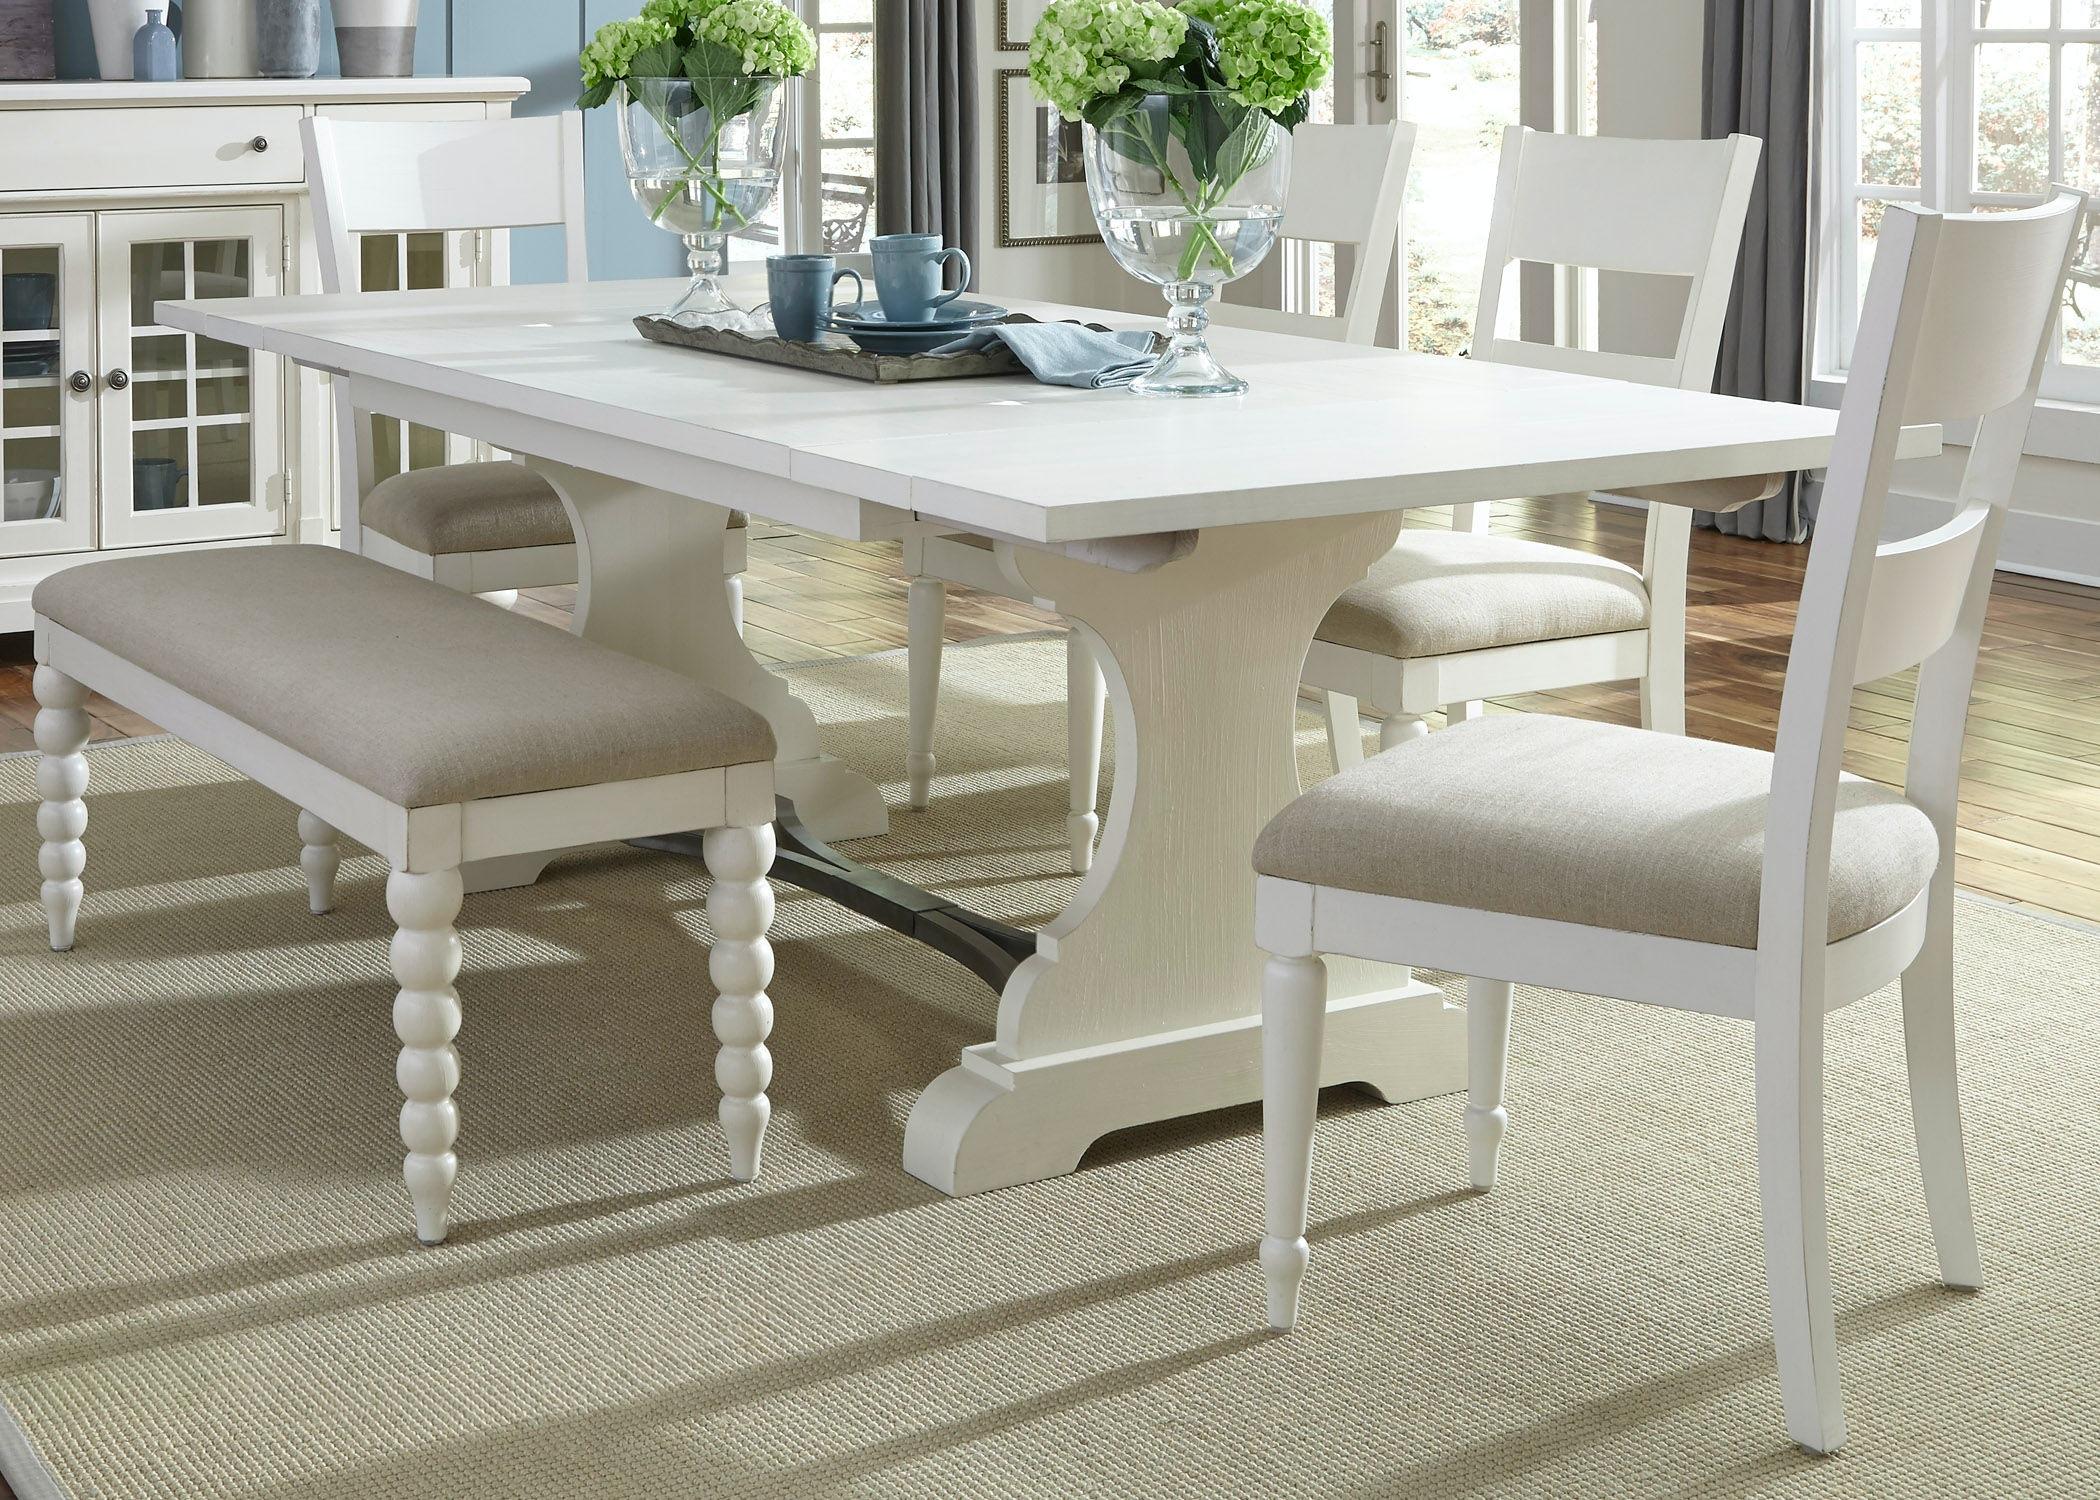 Liberty Furniture 6 Piece Trestle Table Set 631 DR 6TRS